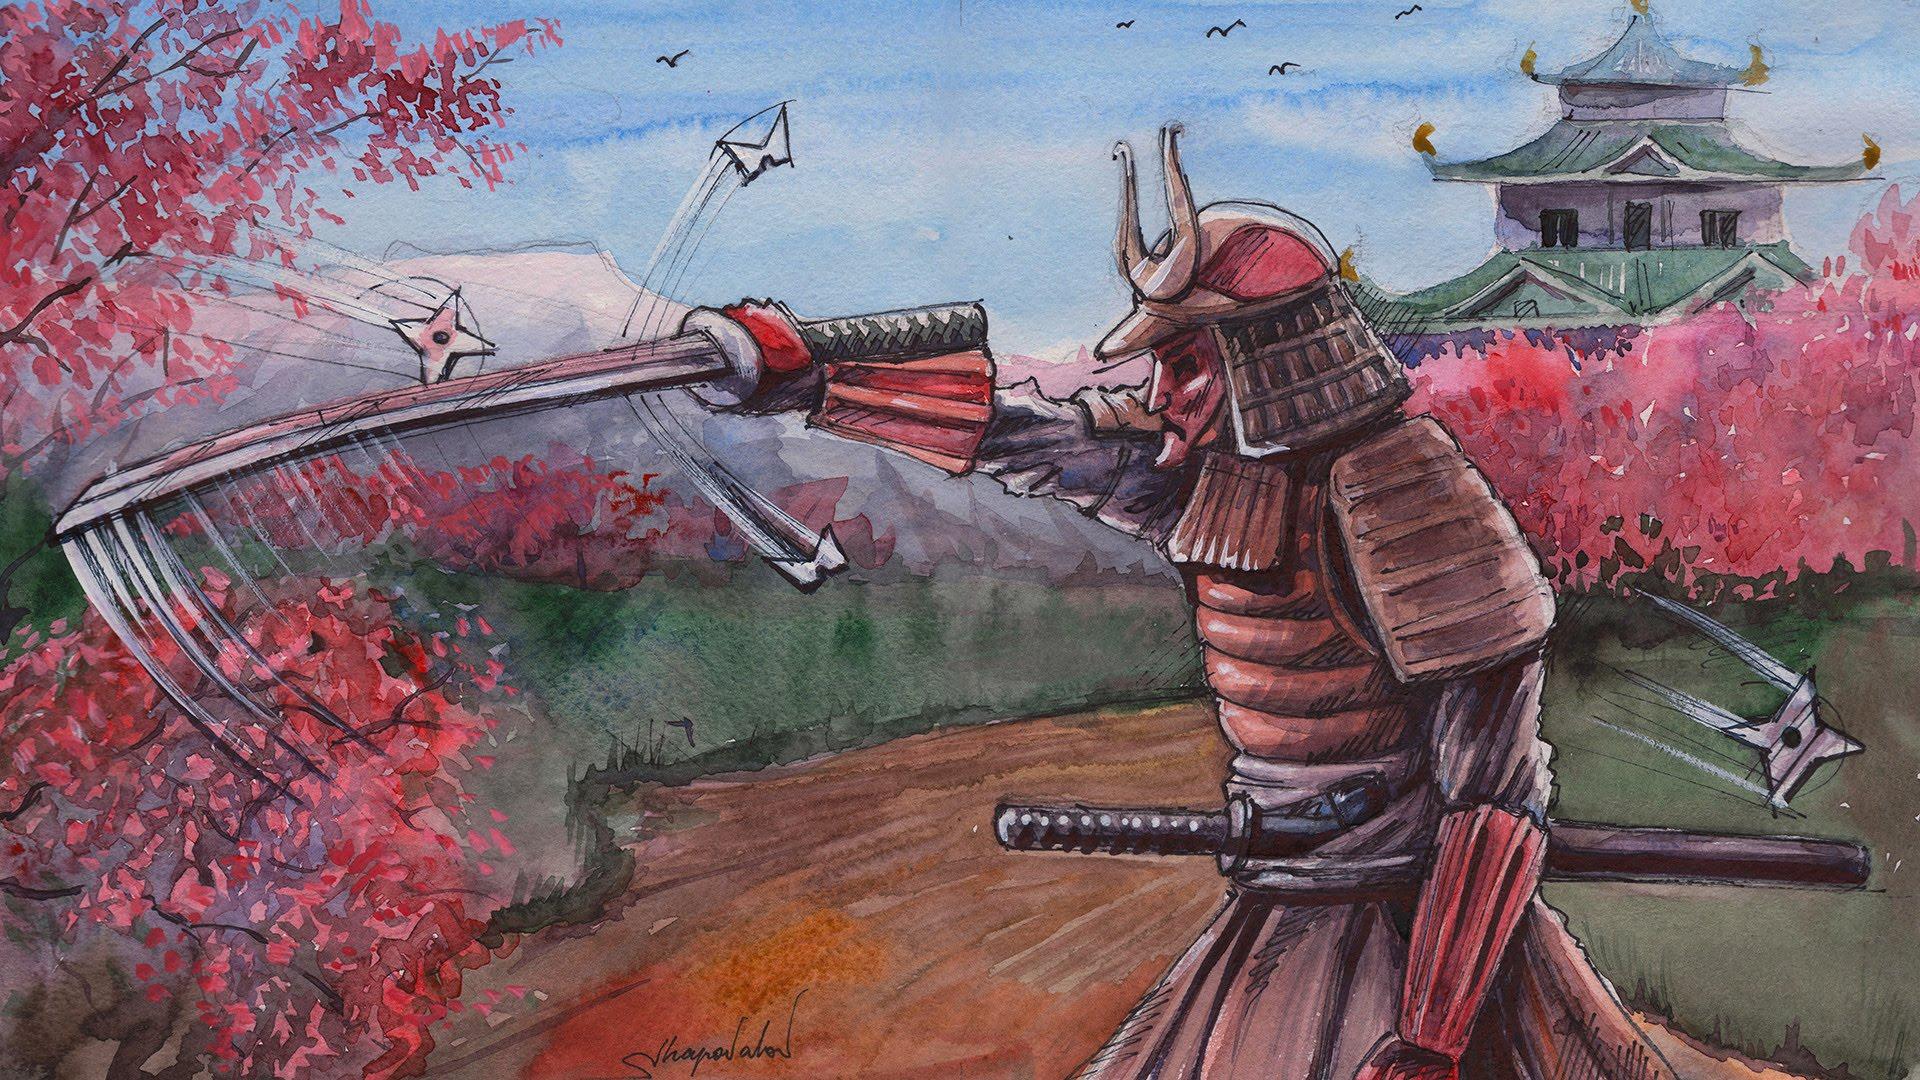 Drawn samurai japanese ninja By Watercolor Watercolor Drawing by